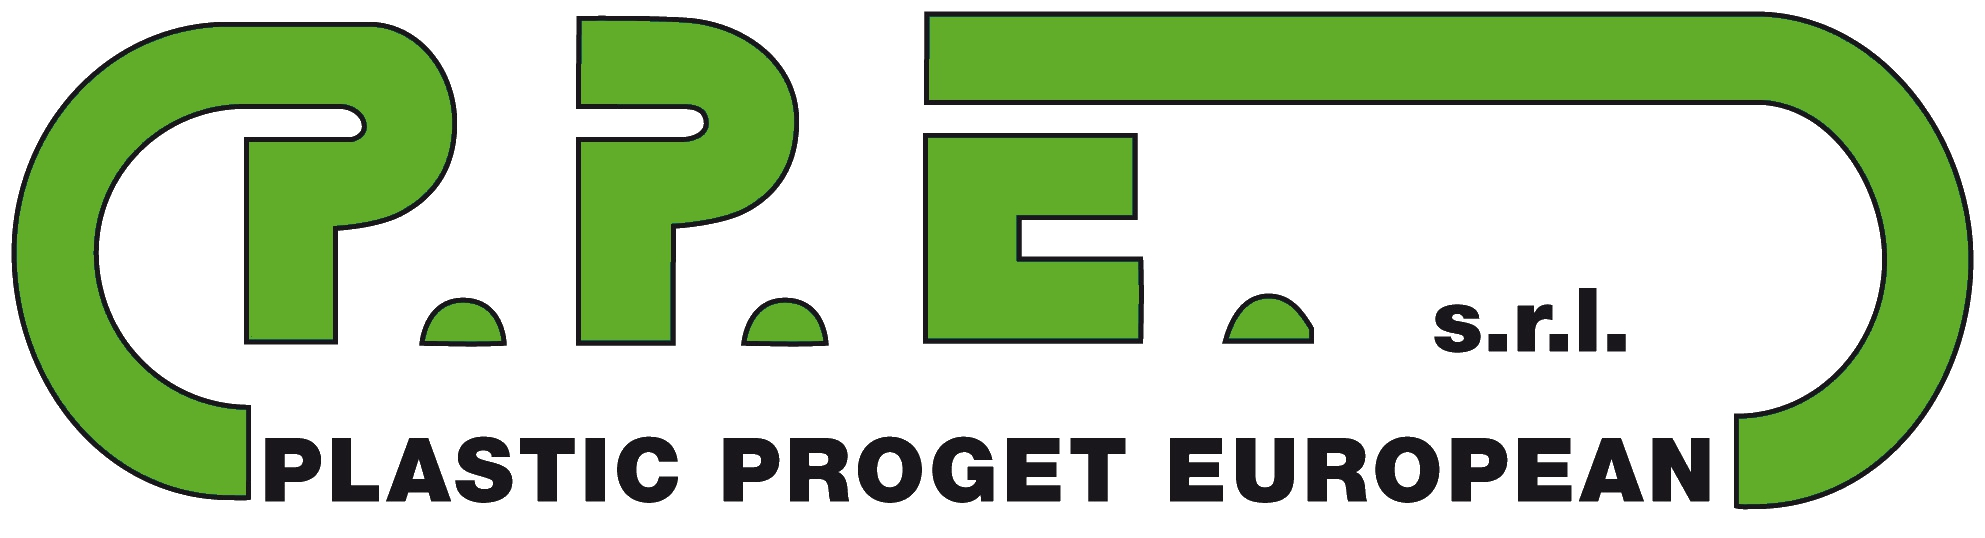 plastic-proget-european-srl-p-p-e